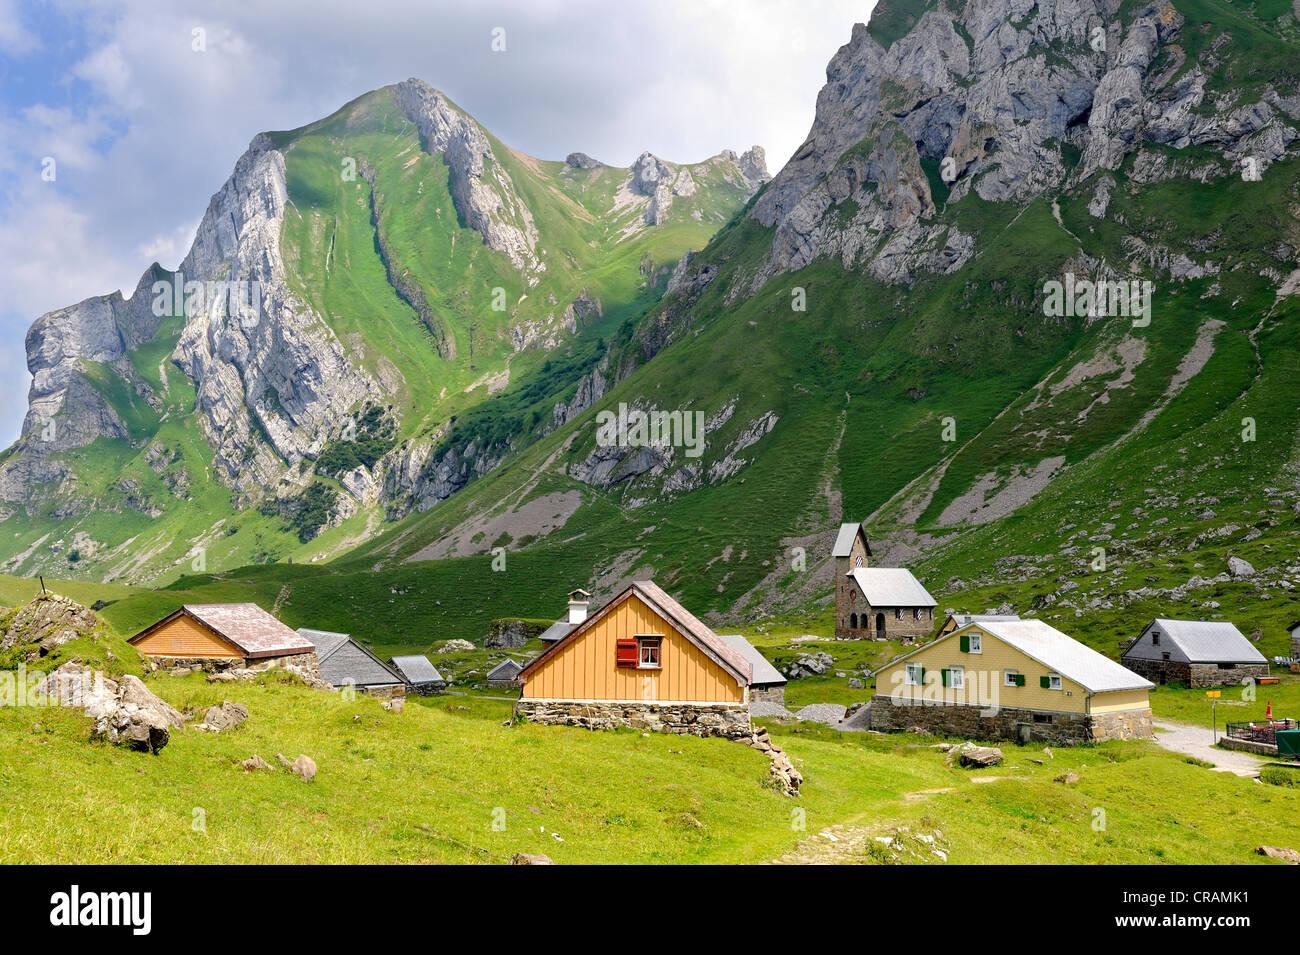 Alpine huts, Alpine hamlet Meglisalp at 1517m altitude in the Appenzell Alps, Canton Appenzell Innerrhoden, Switzerland, - Stock Image